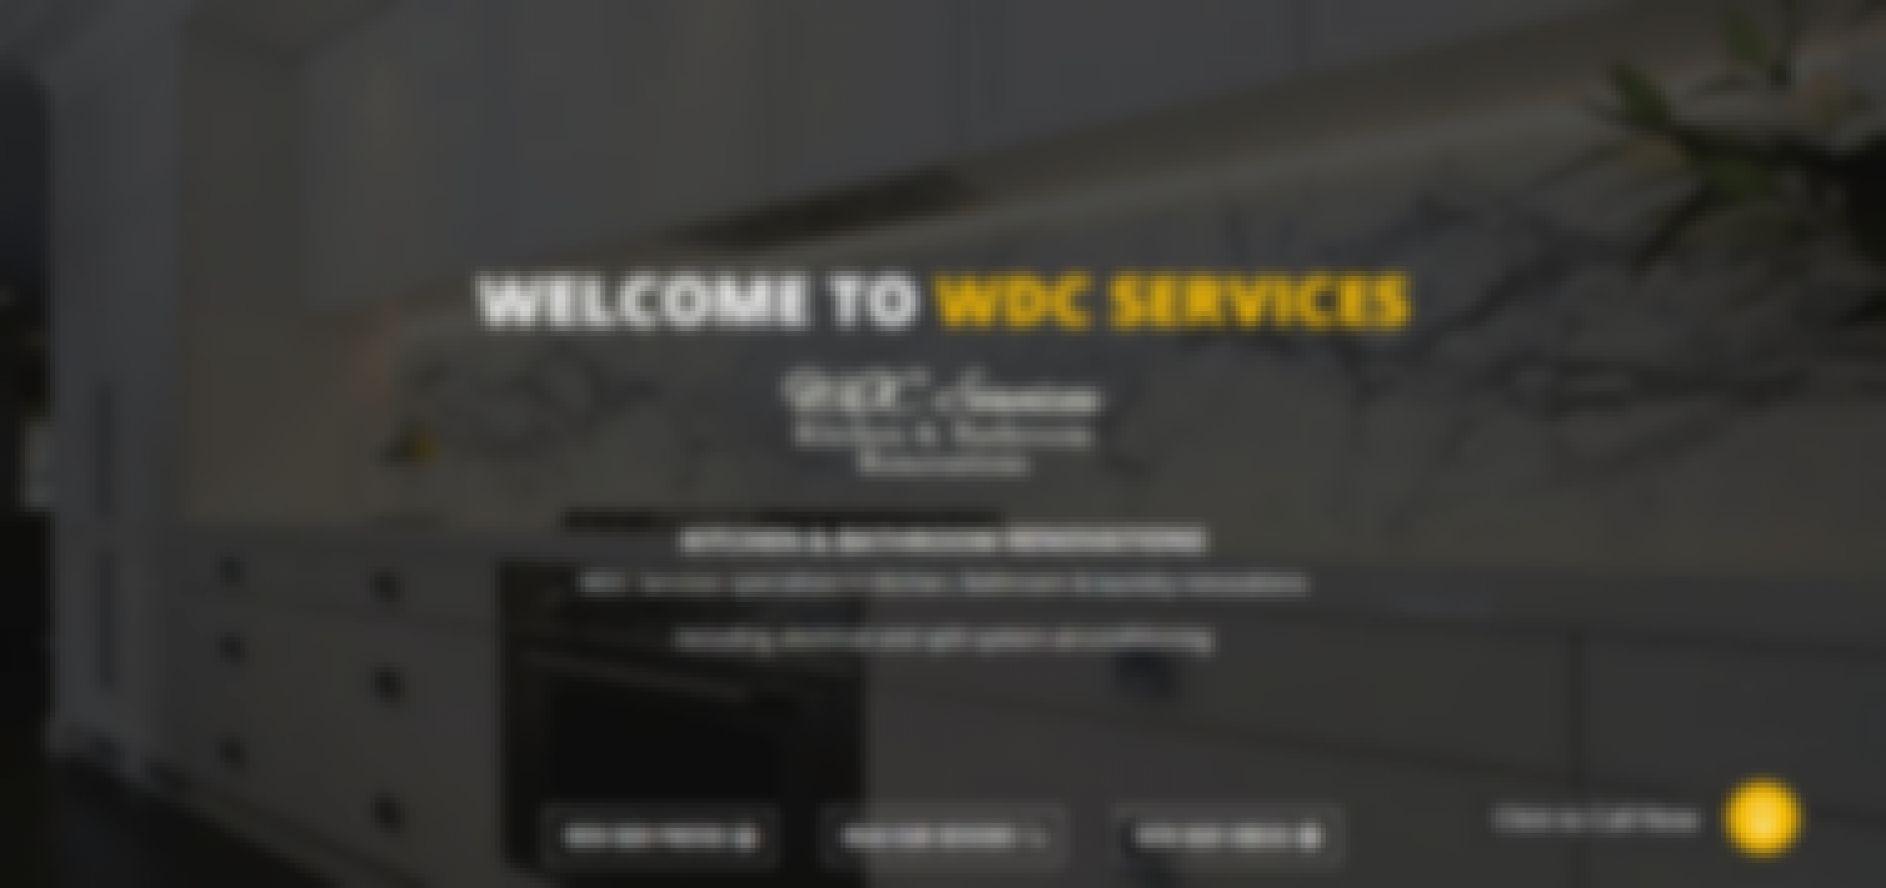 wdc services